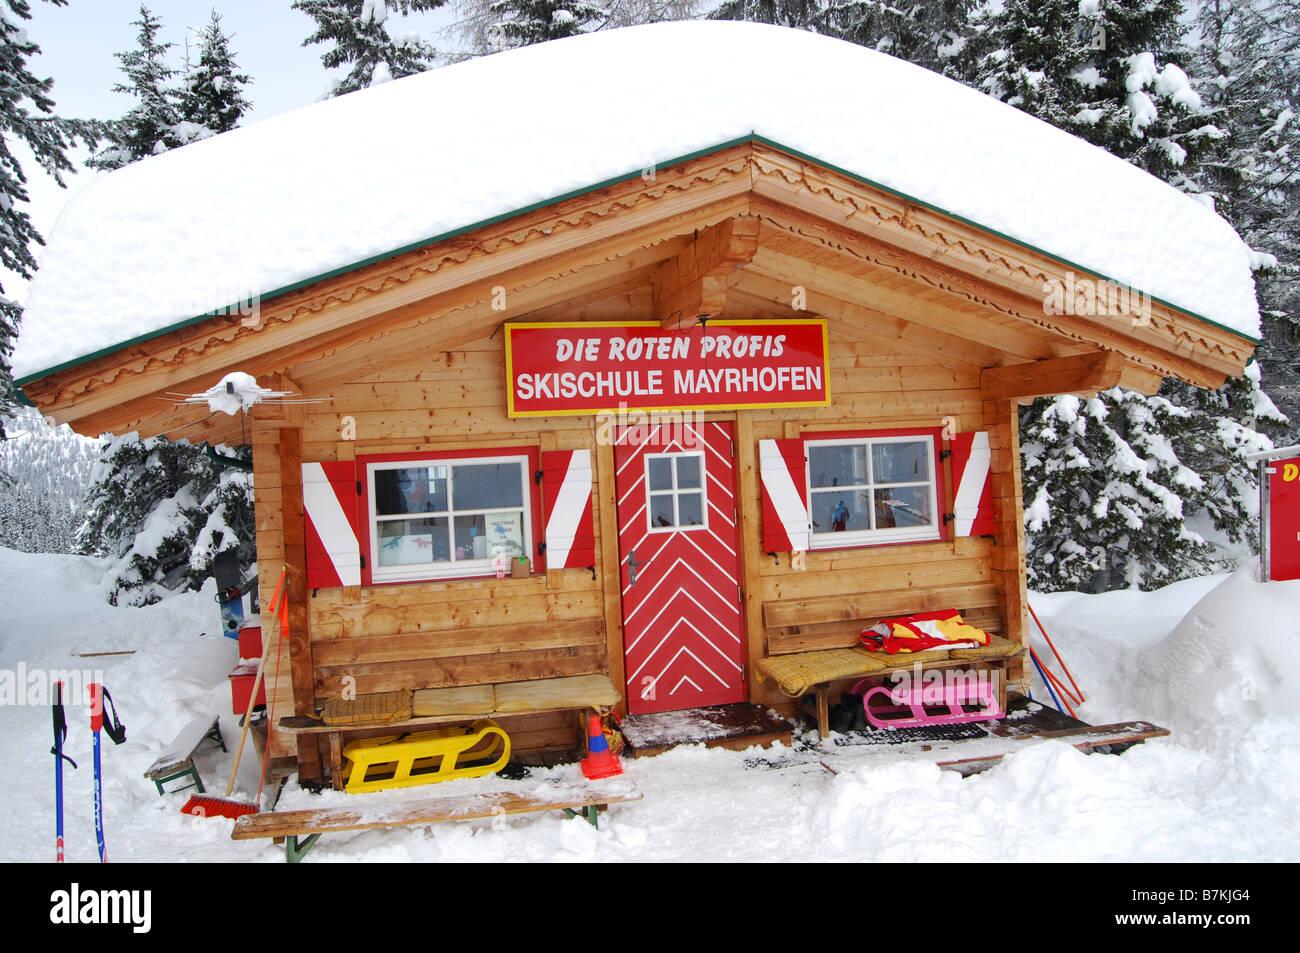 ski school Penkenbahn mayrhofen Tyrol Austria - Stock Image